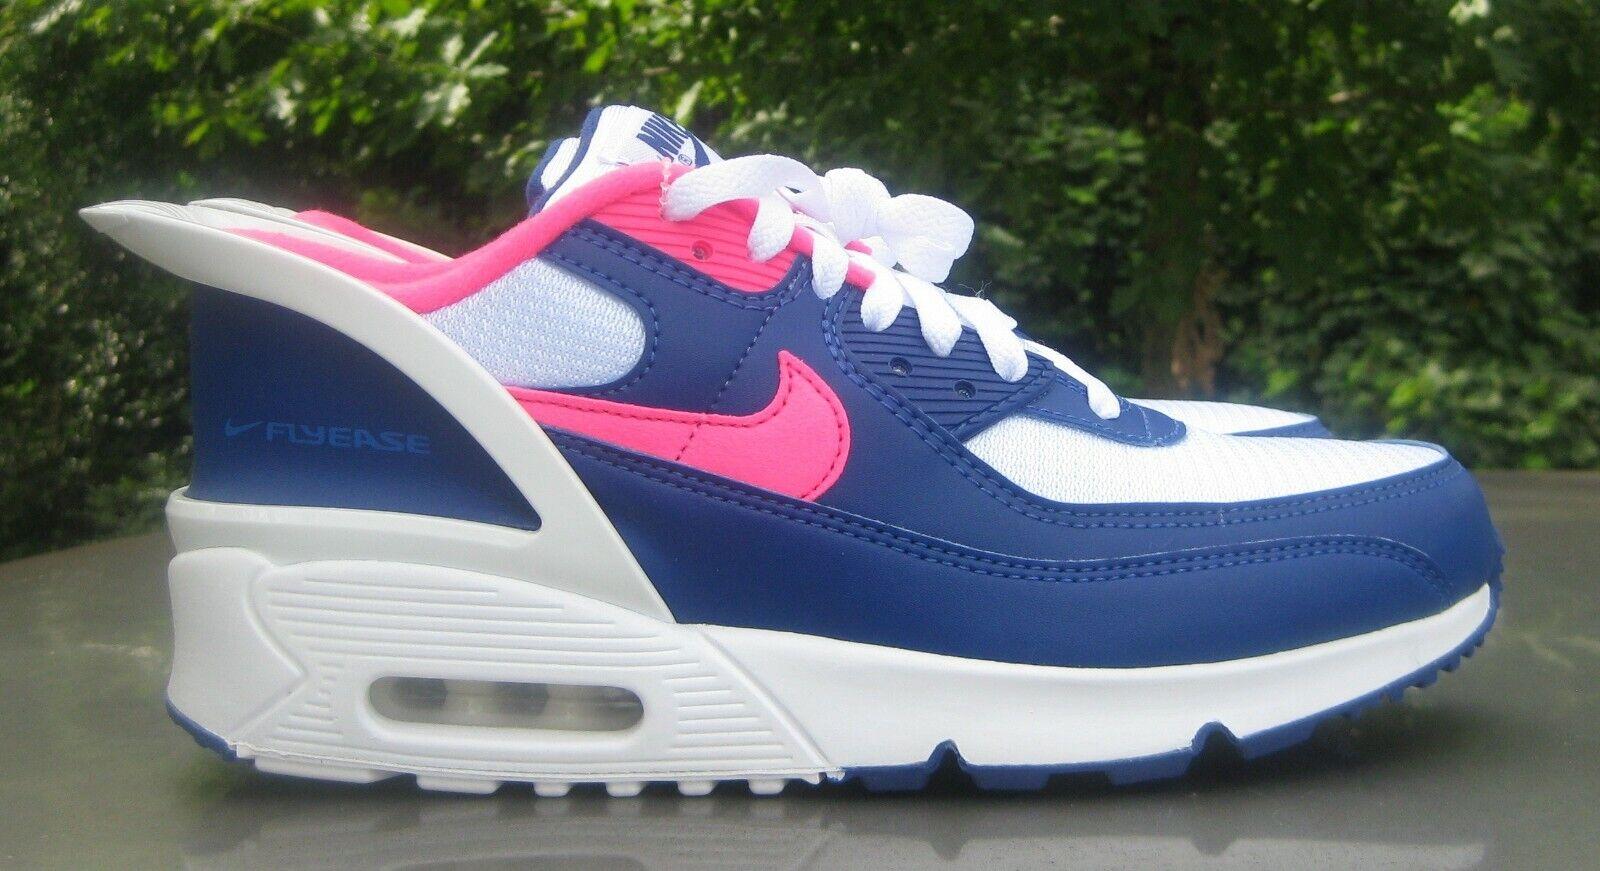 Nike Air Max 90 flyease bleu/rose CV0526-101 Taille 7Y jeunesse/Men's 7/Femmes 8.5